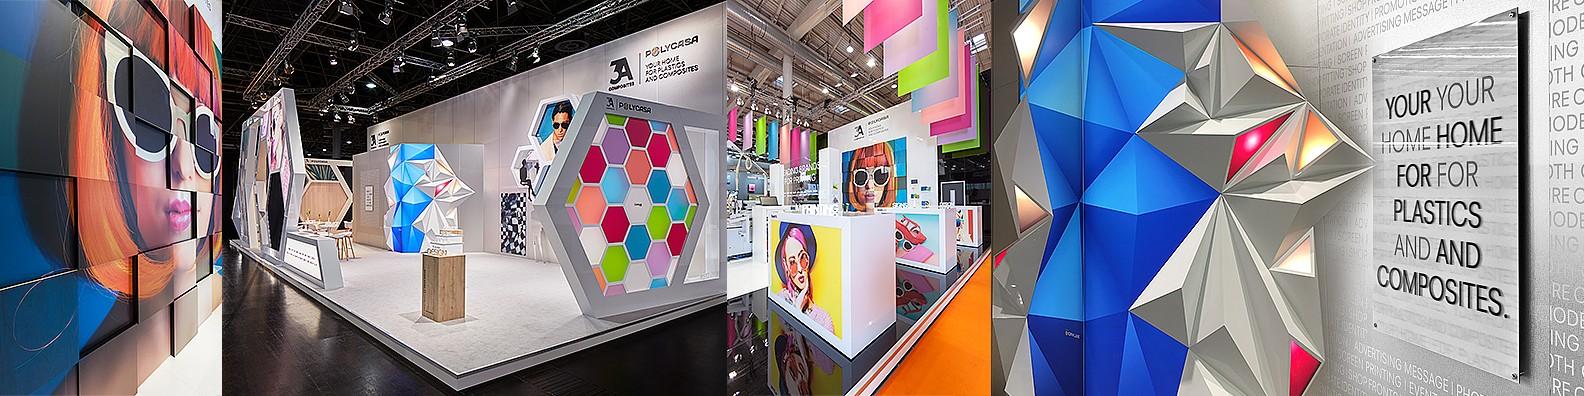 3A Composites GmbH | LinkedIn